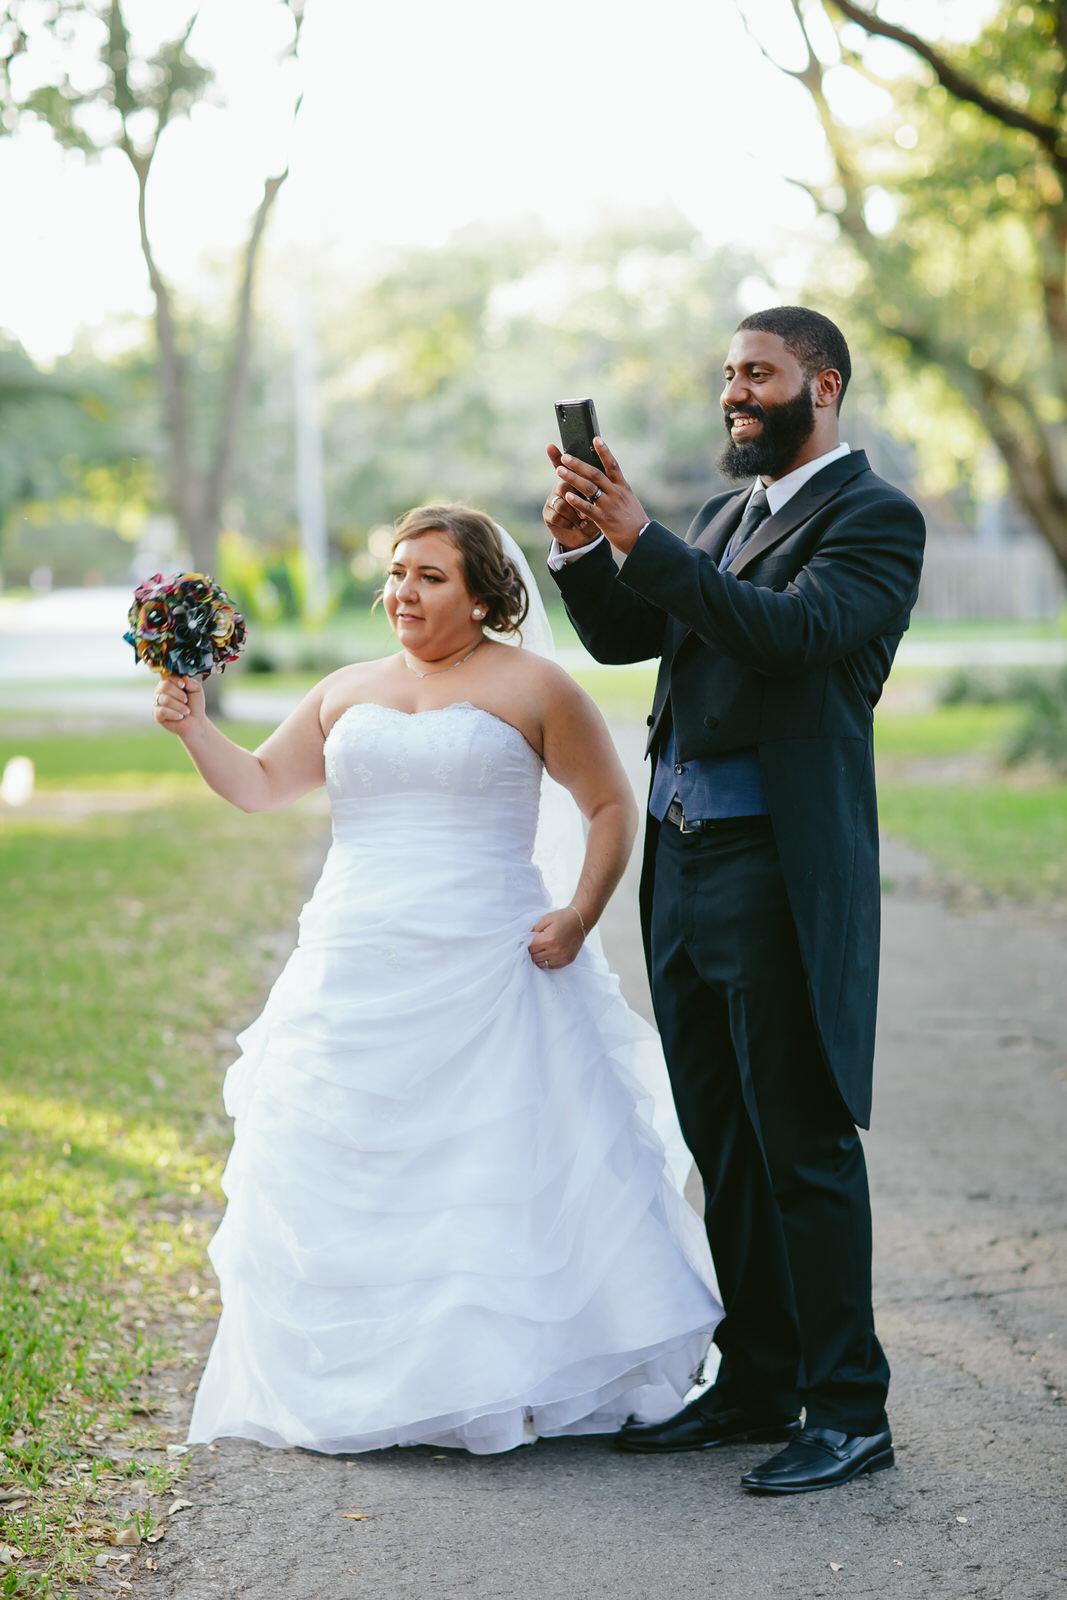 bride-and-groom-funny-scene-moments-tiny-house-photo-florida-wedding-photographer.jpg